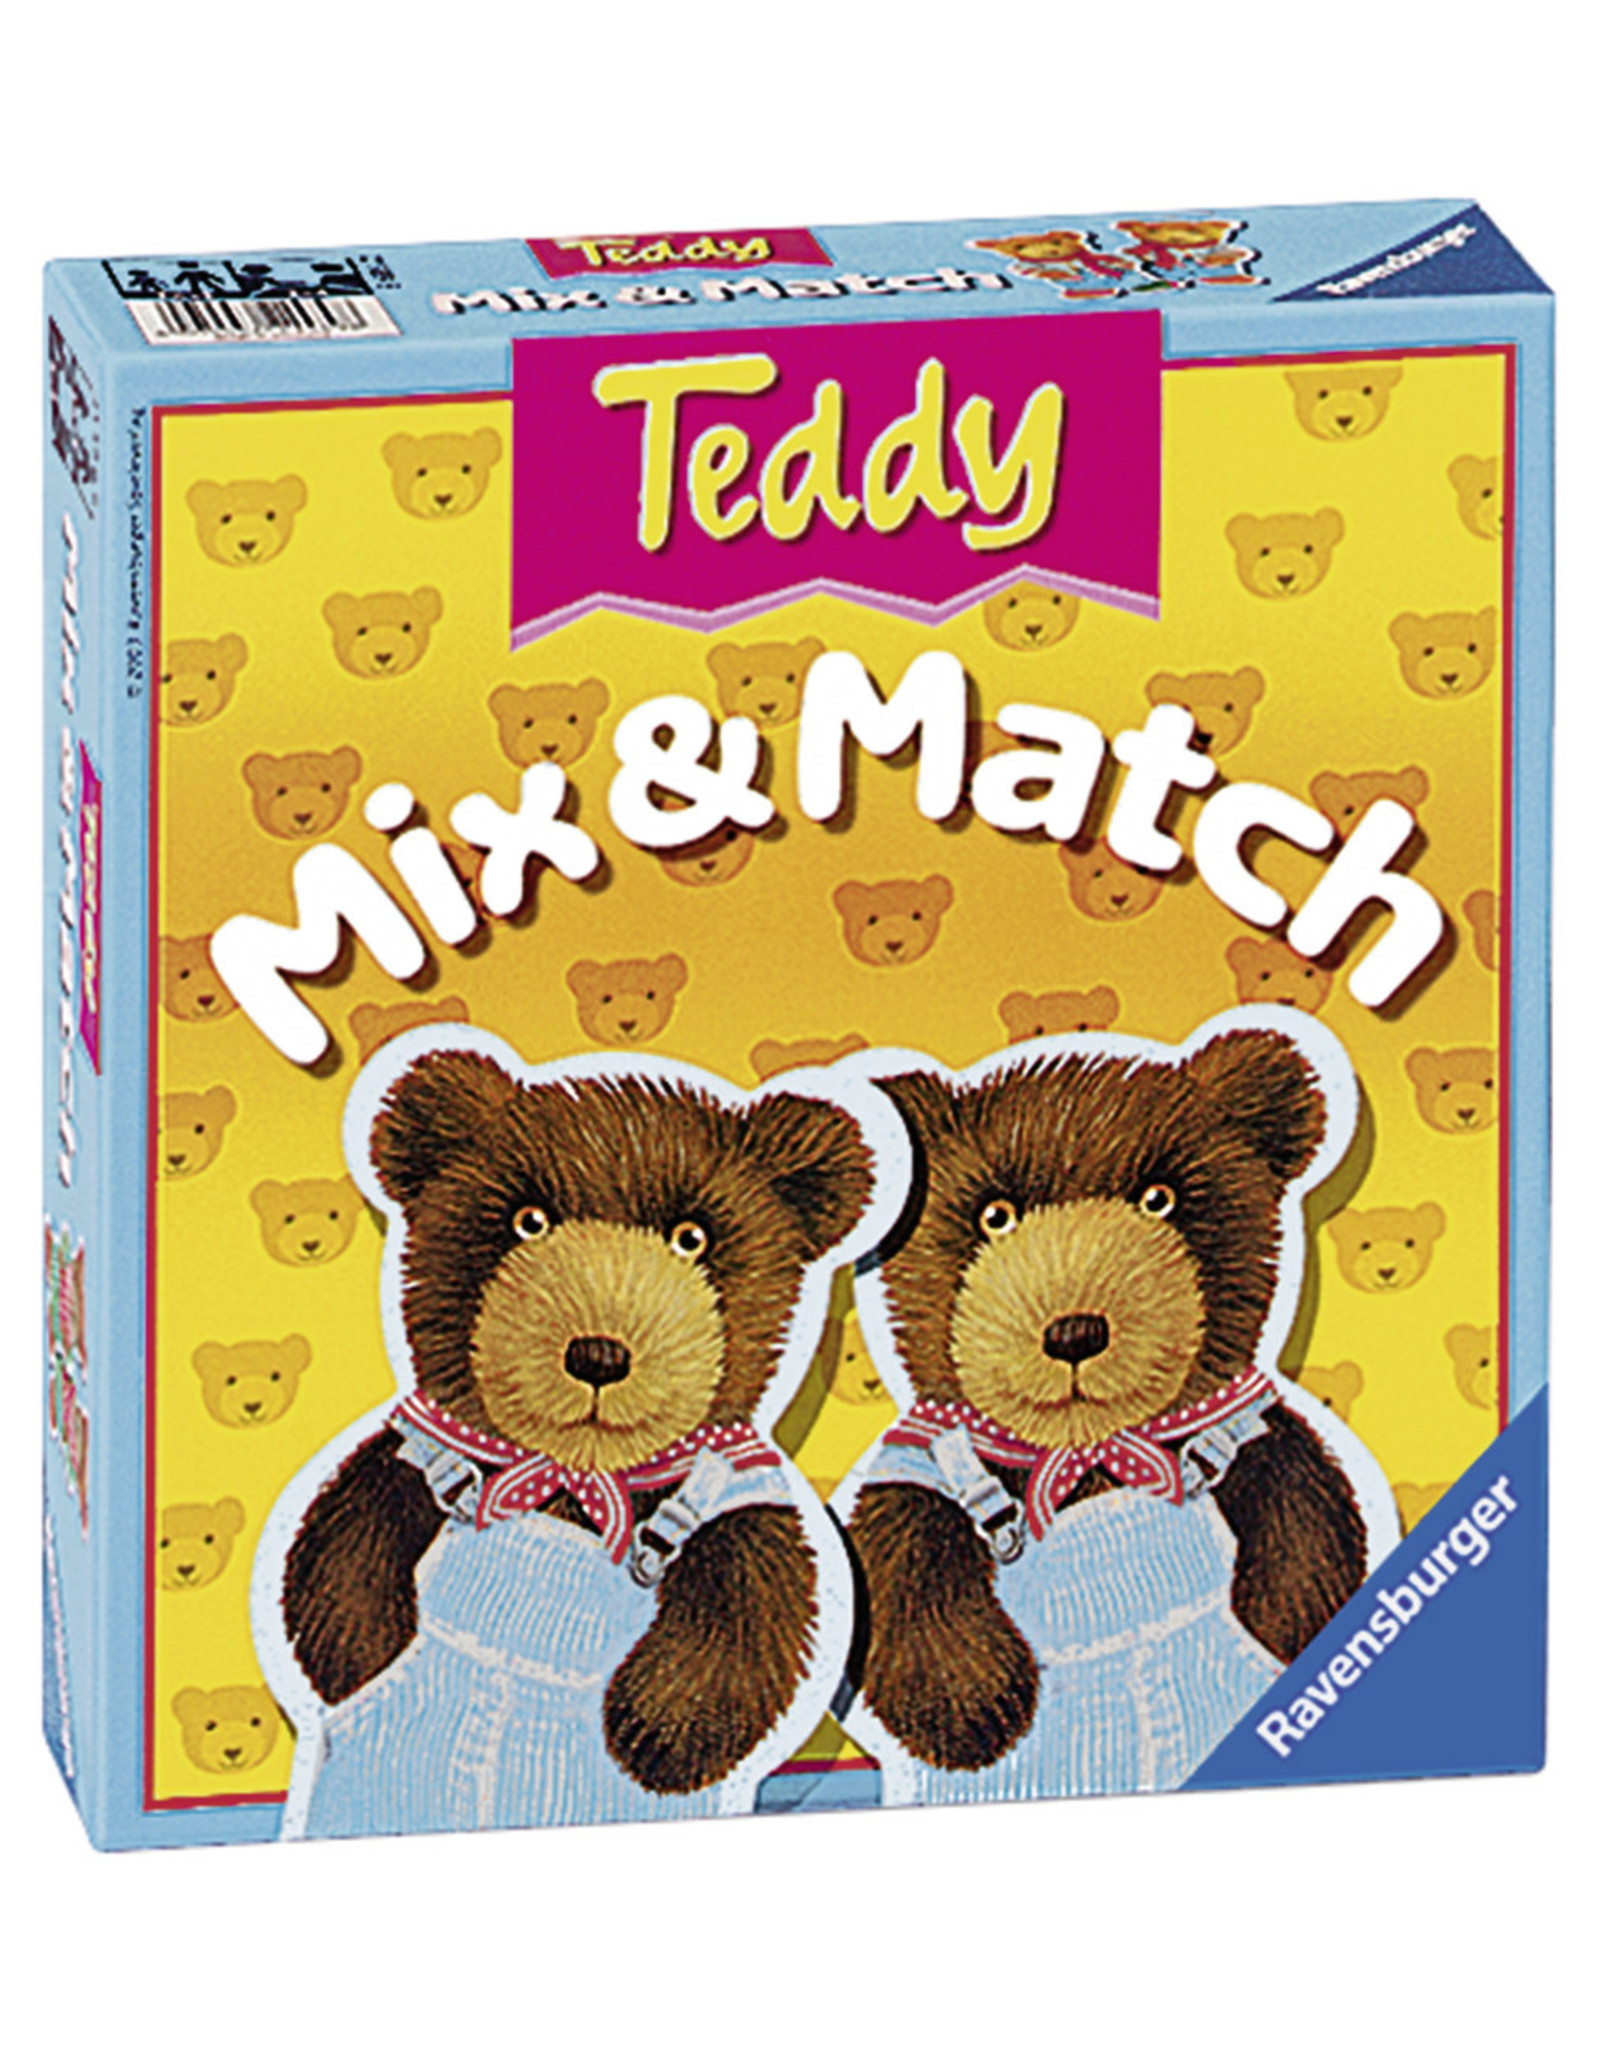 Ravensburger Teddy Mix & Match Game